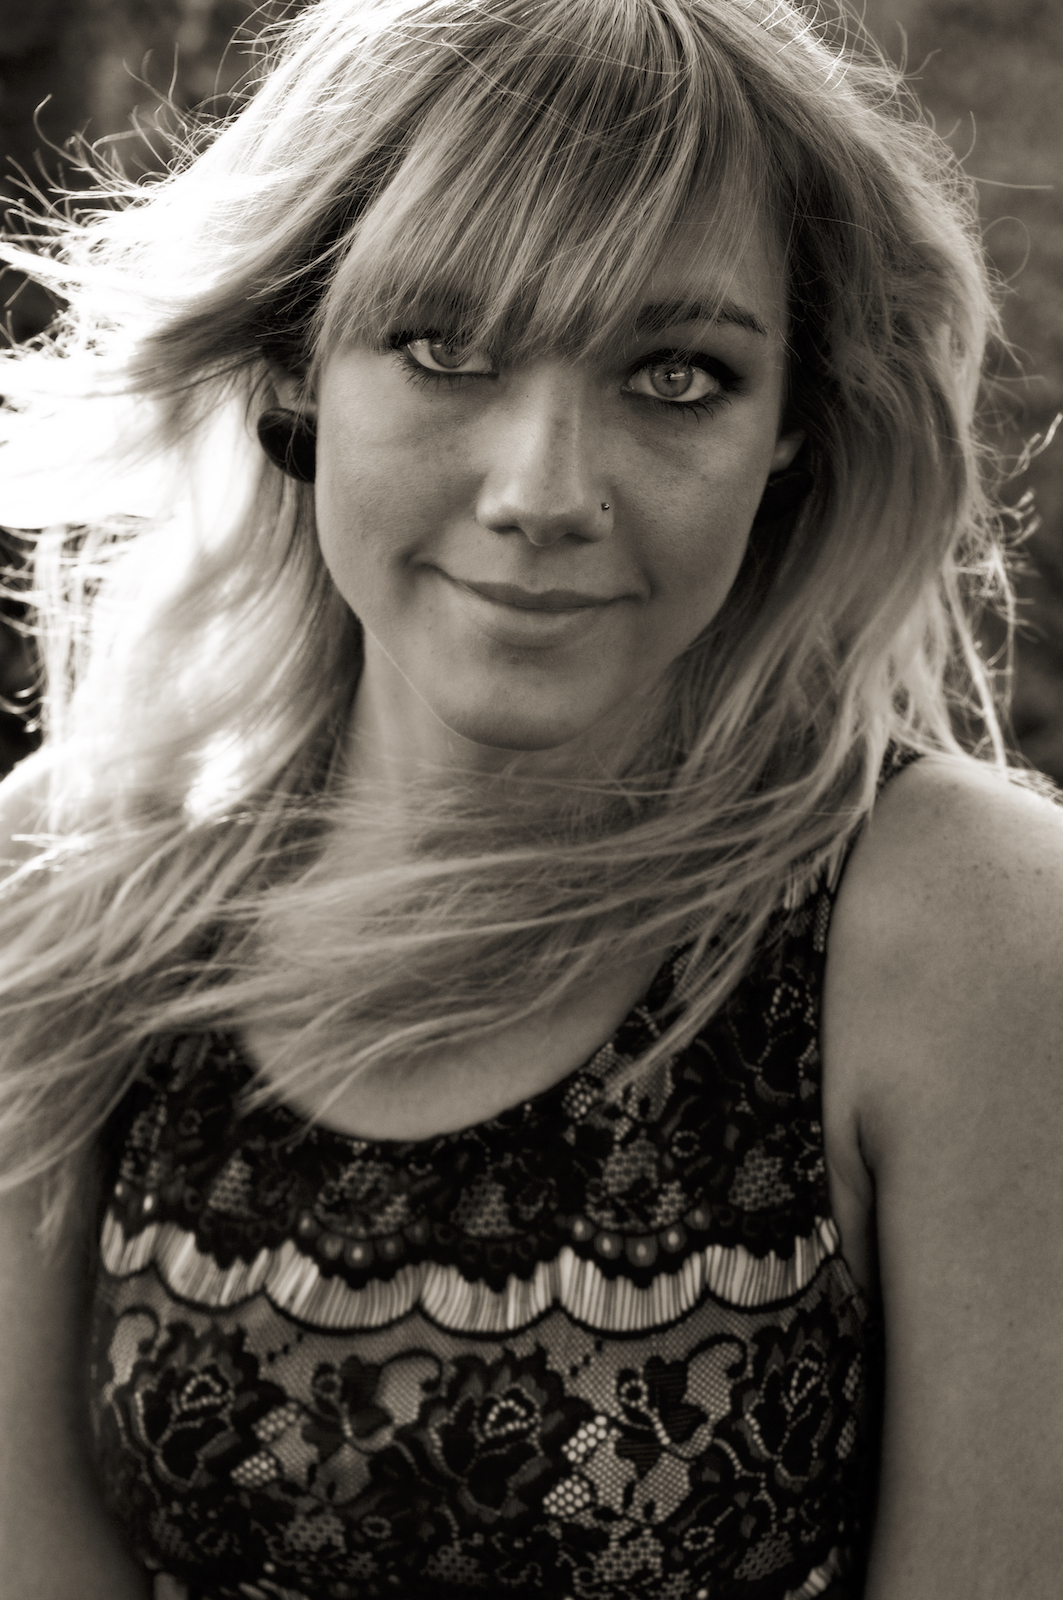 Elisa Harding in New Orleans City Park, photographed by New Orleans based photographer, Marc Pagani